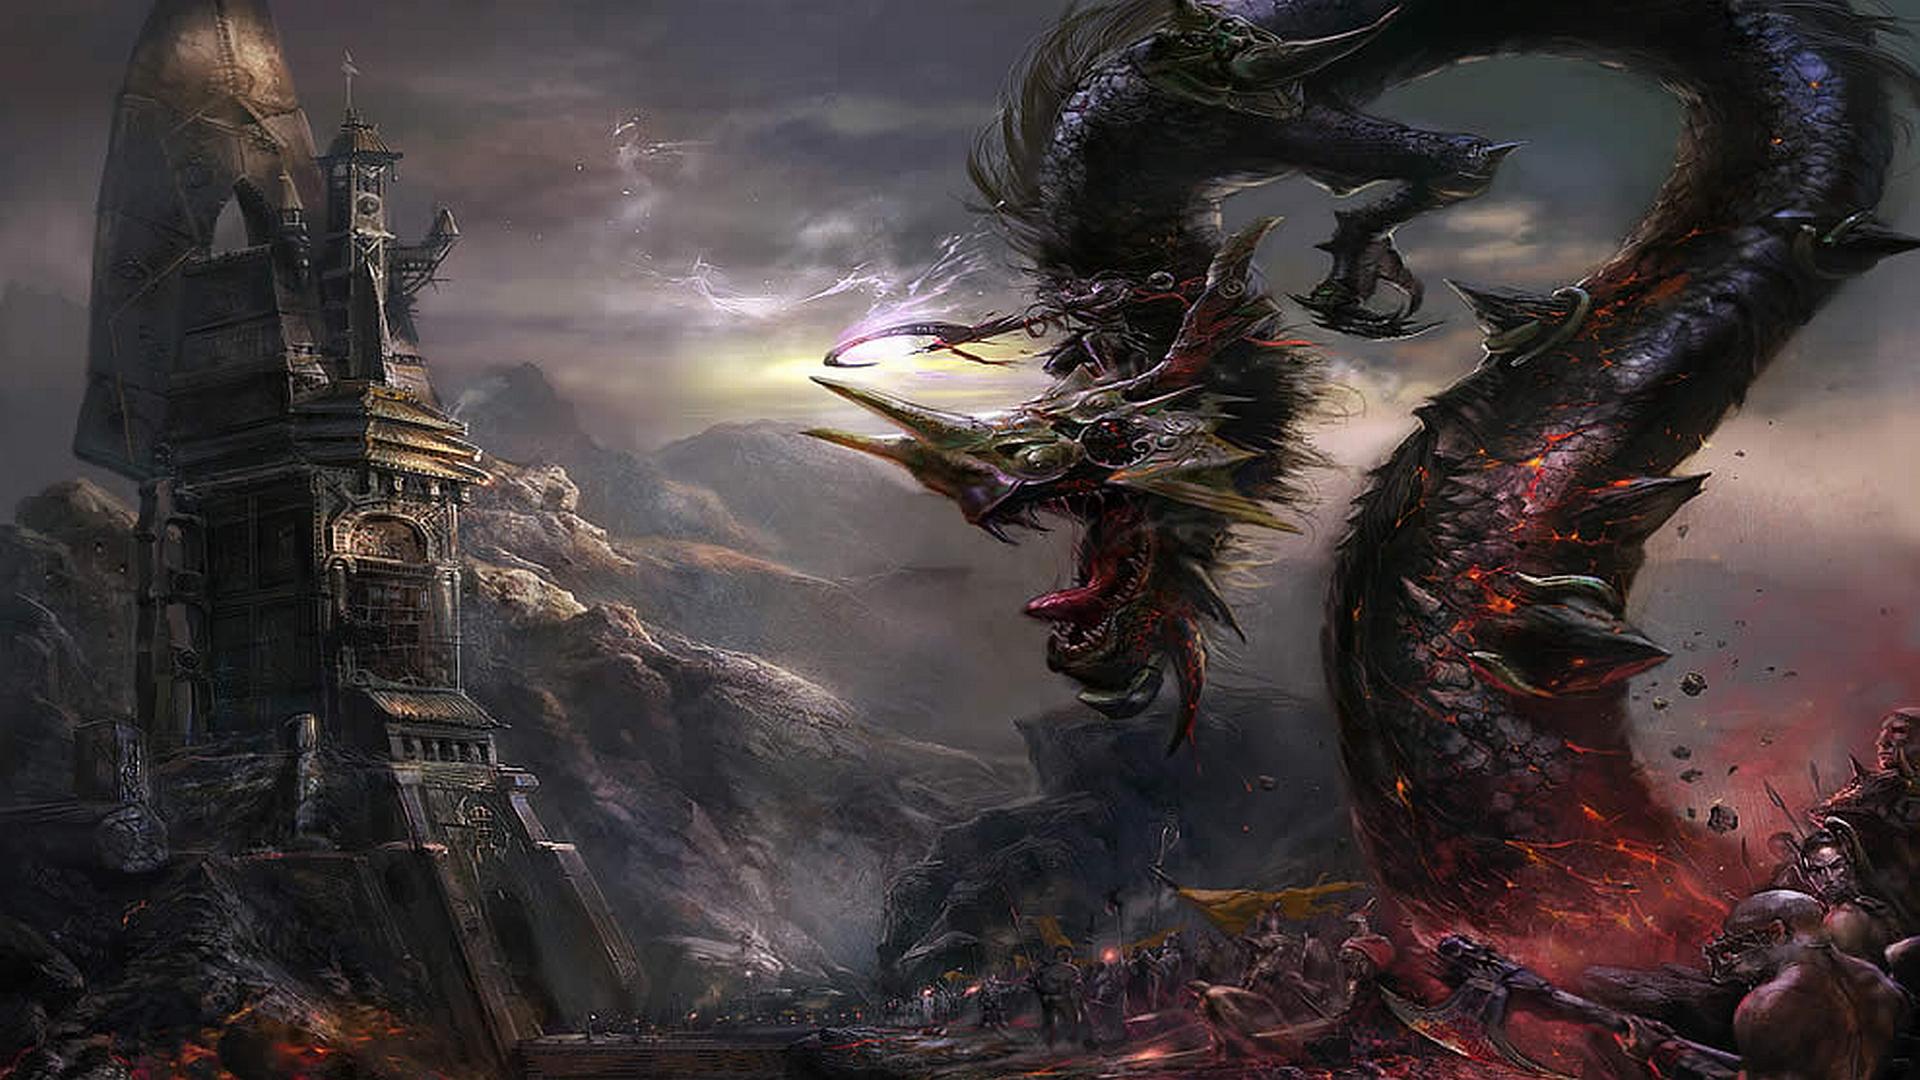 Wallpapers De Demonios Fantasia Etc Parte 2 Resubido En Taringa